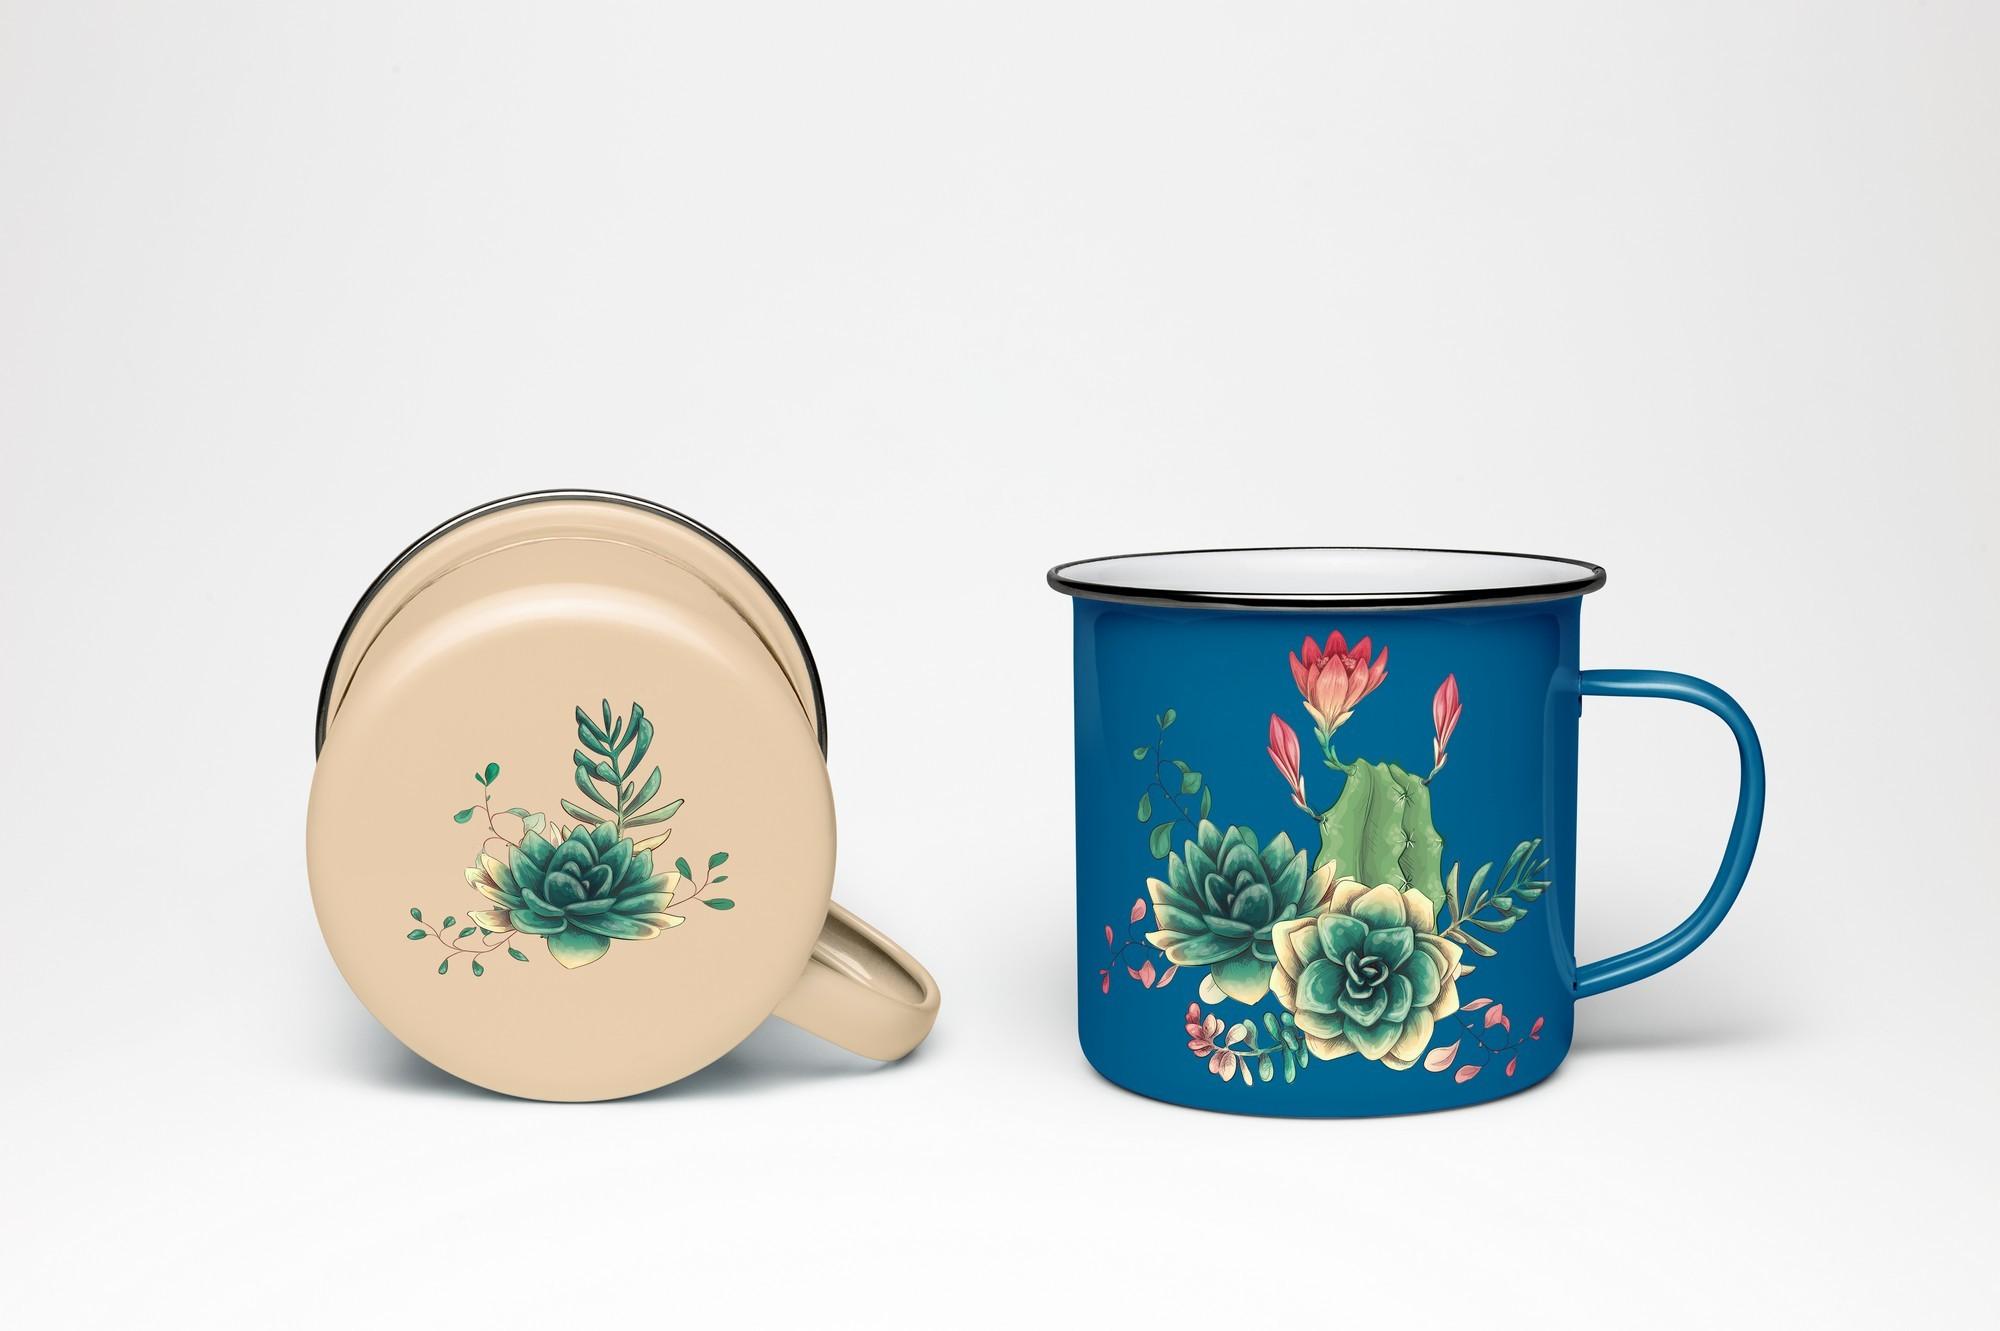 Cute Cactus Clipart: Cacti & Succulents Vectors - Image00011